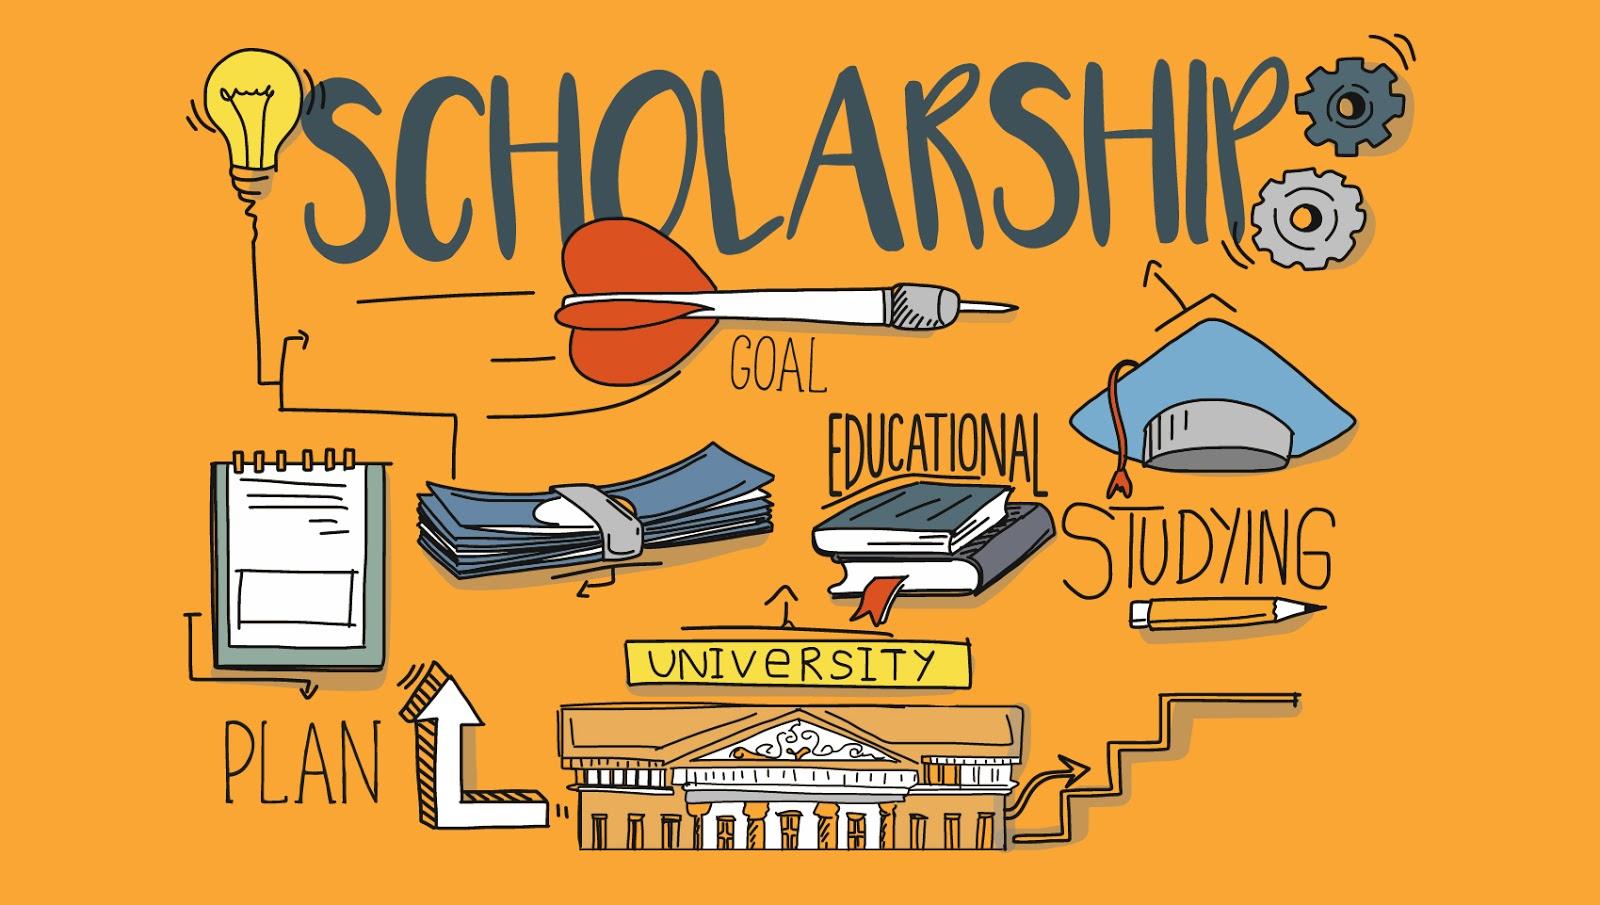 Scholarship descriptions